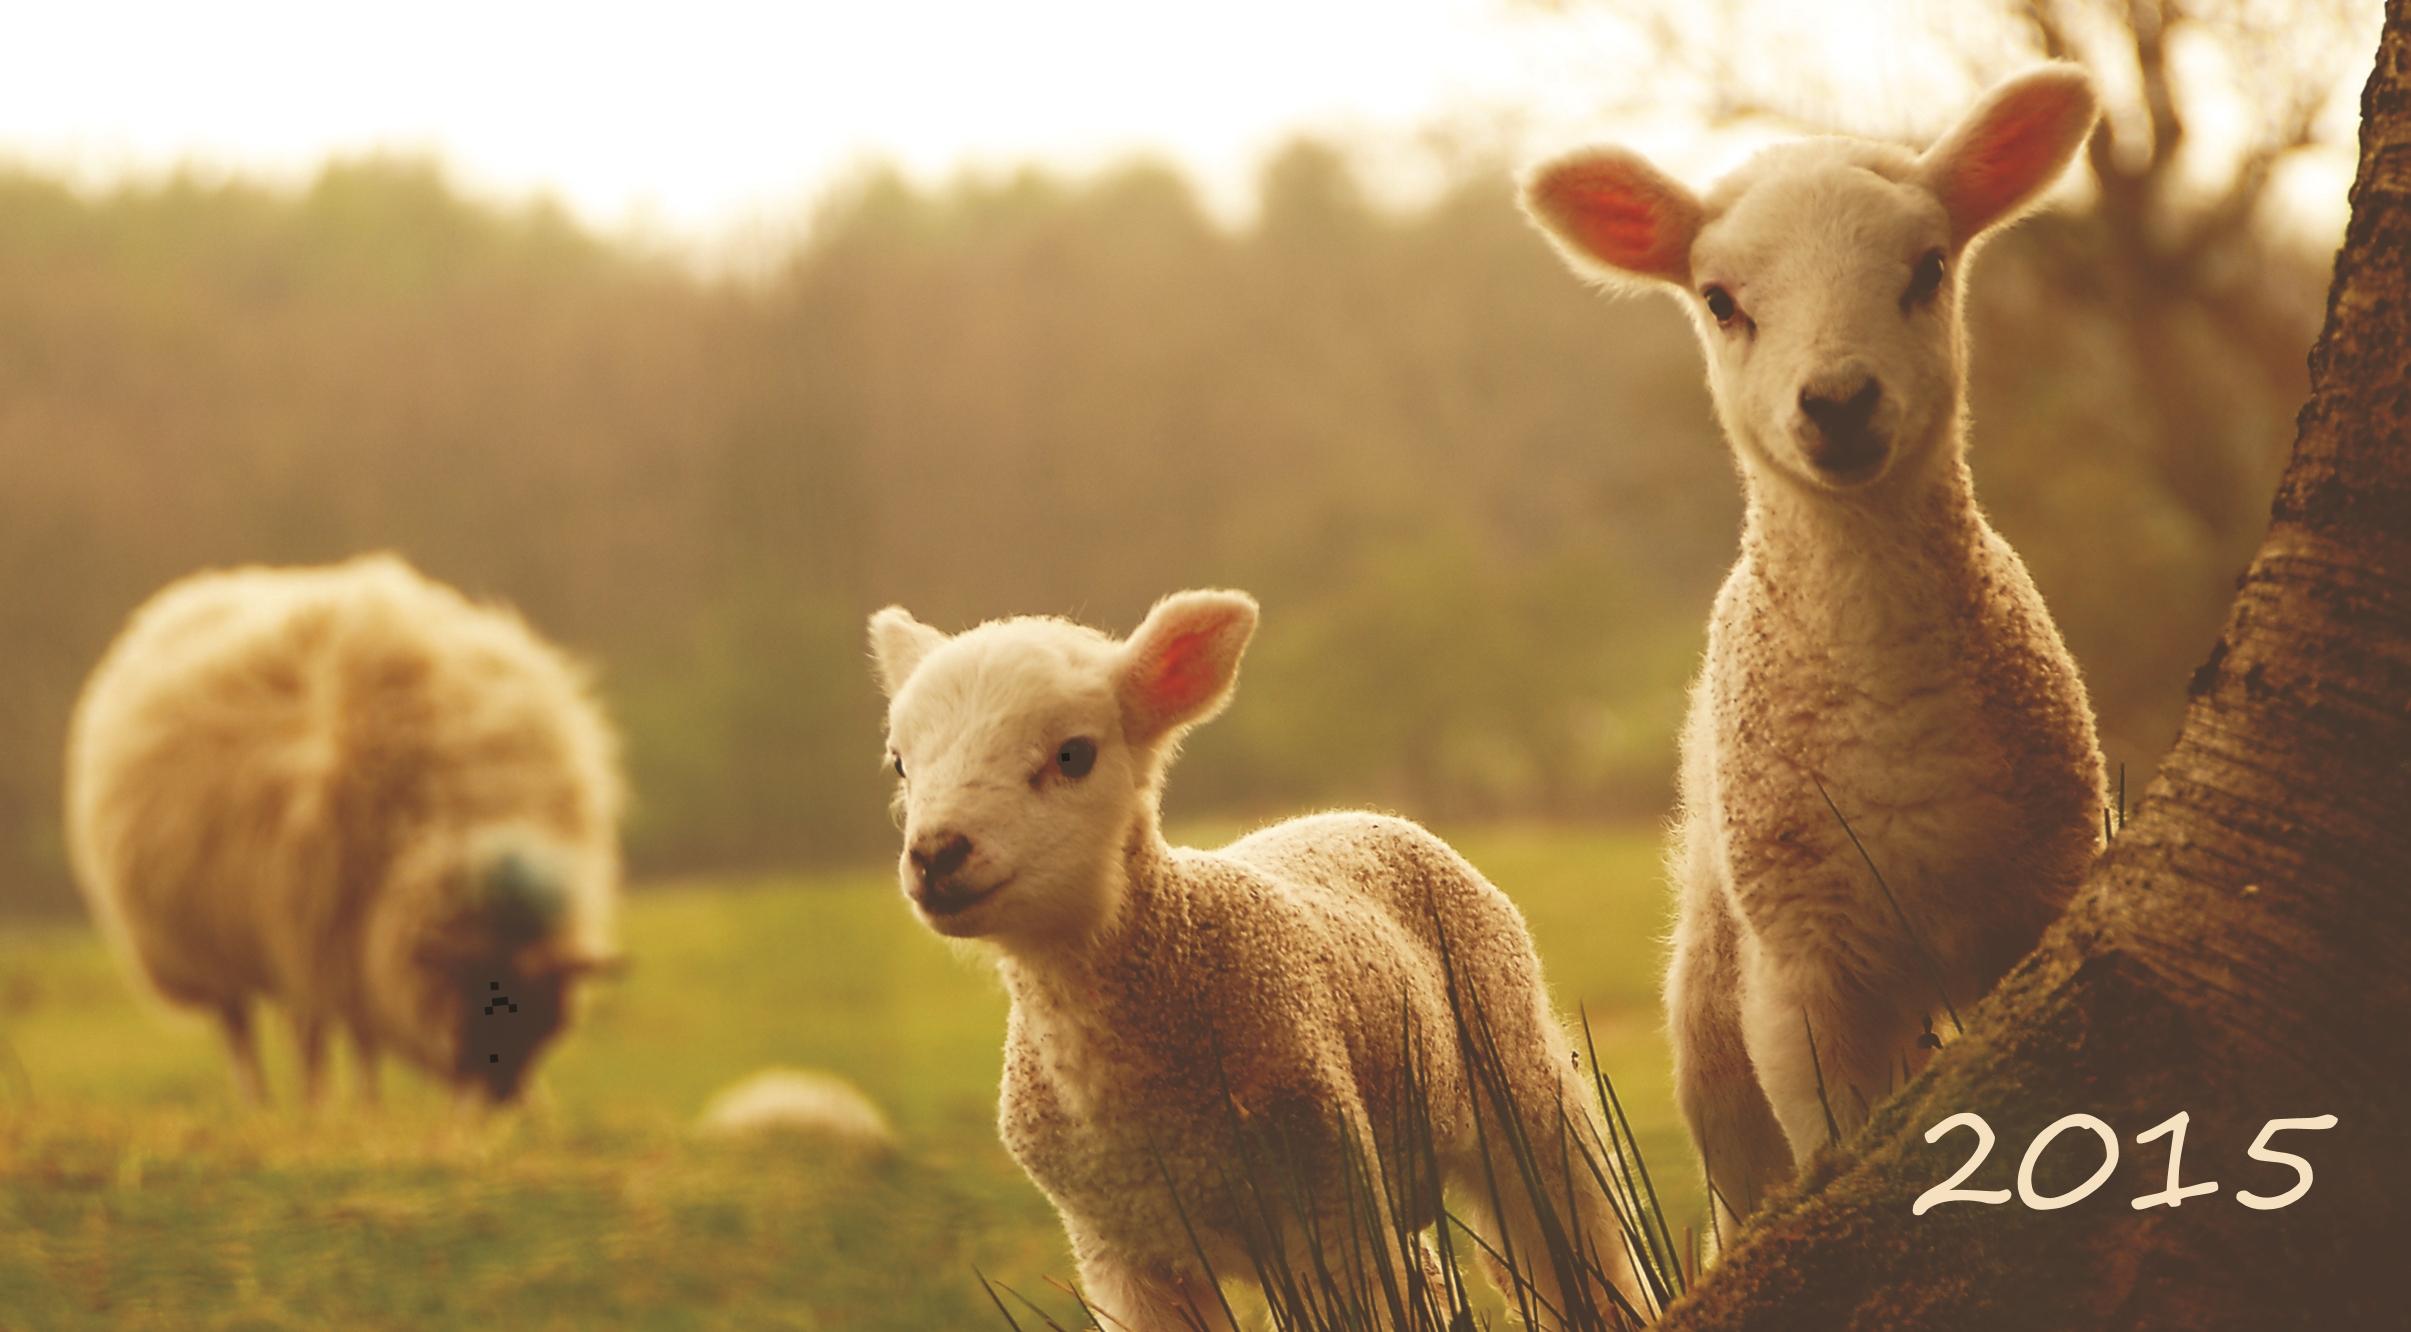 New_Year_wallpapers_New_Year_2015_sheep_088769_.jpg